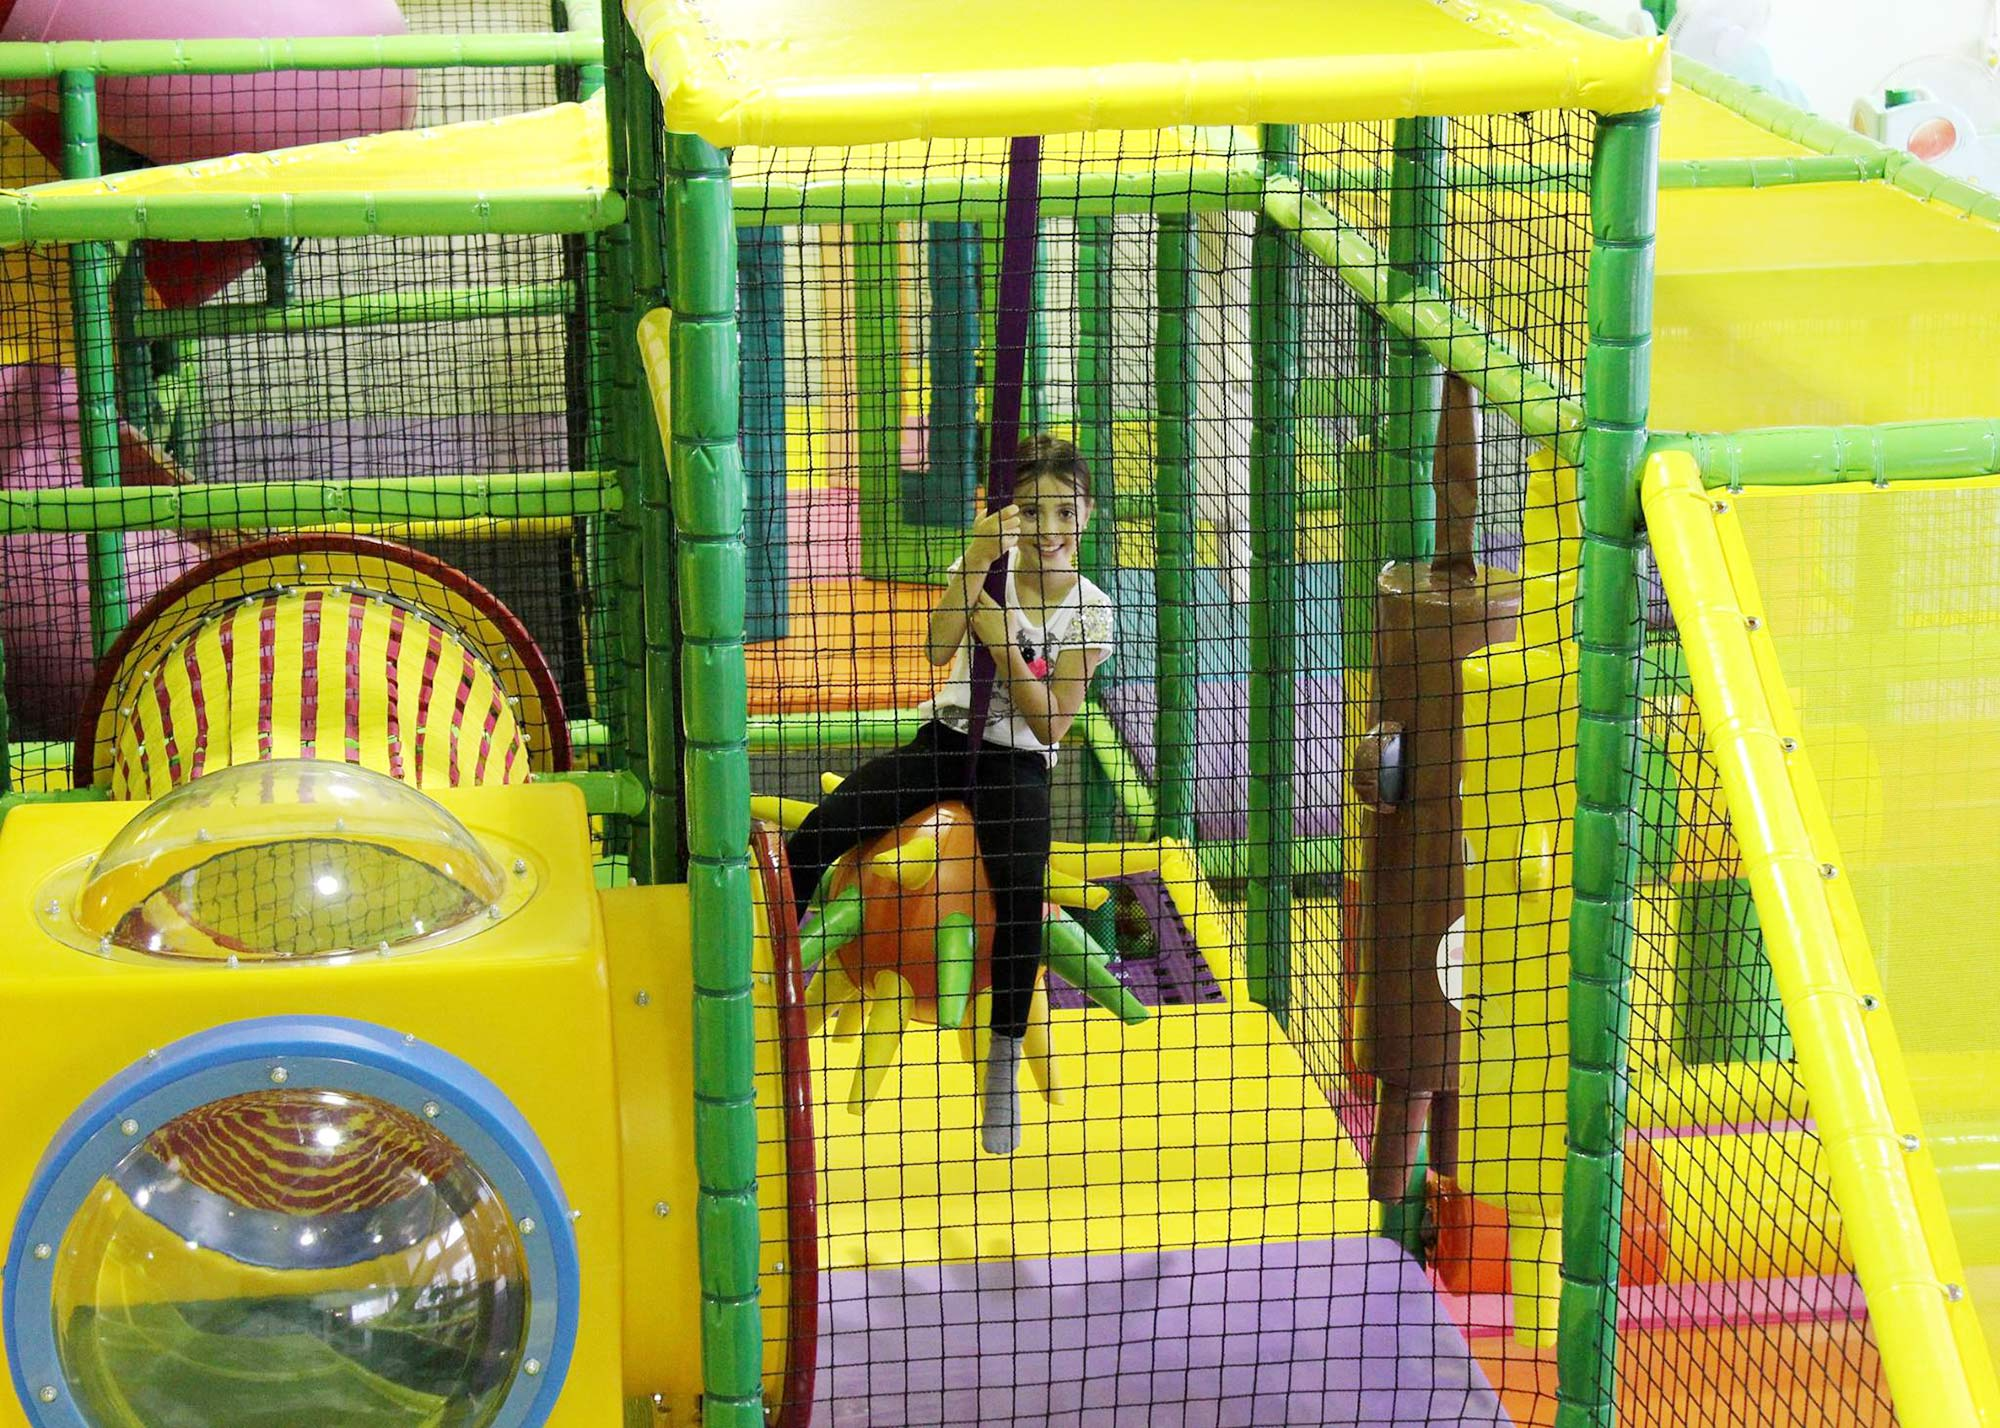 interior-design-indoor-play-facility-girl-playing.jpg